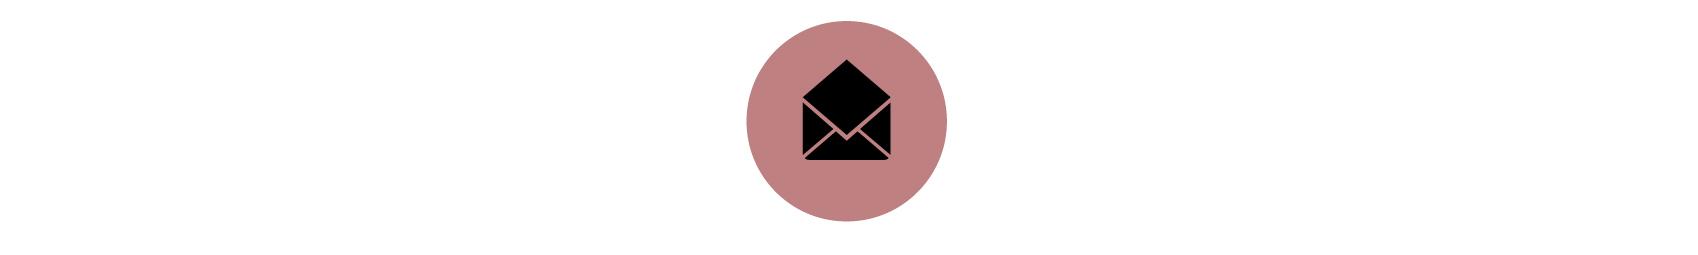 mail meer info gifts vanaf 20 euro